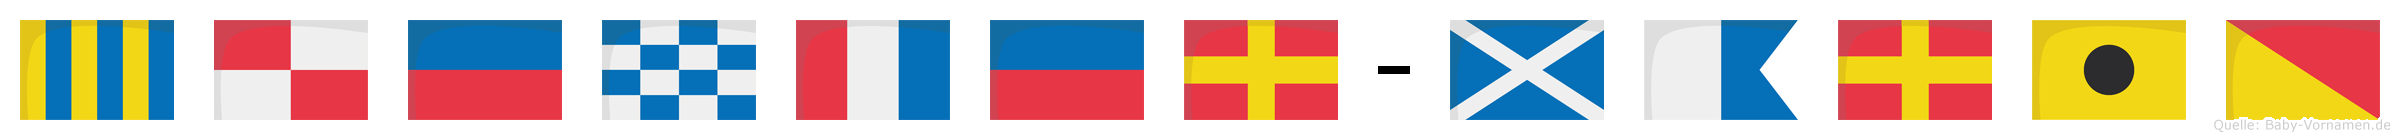 Günter-Mario im Flaggenalphabet